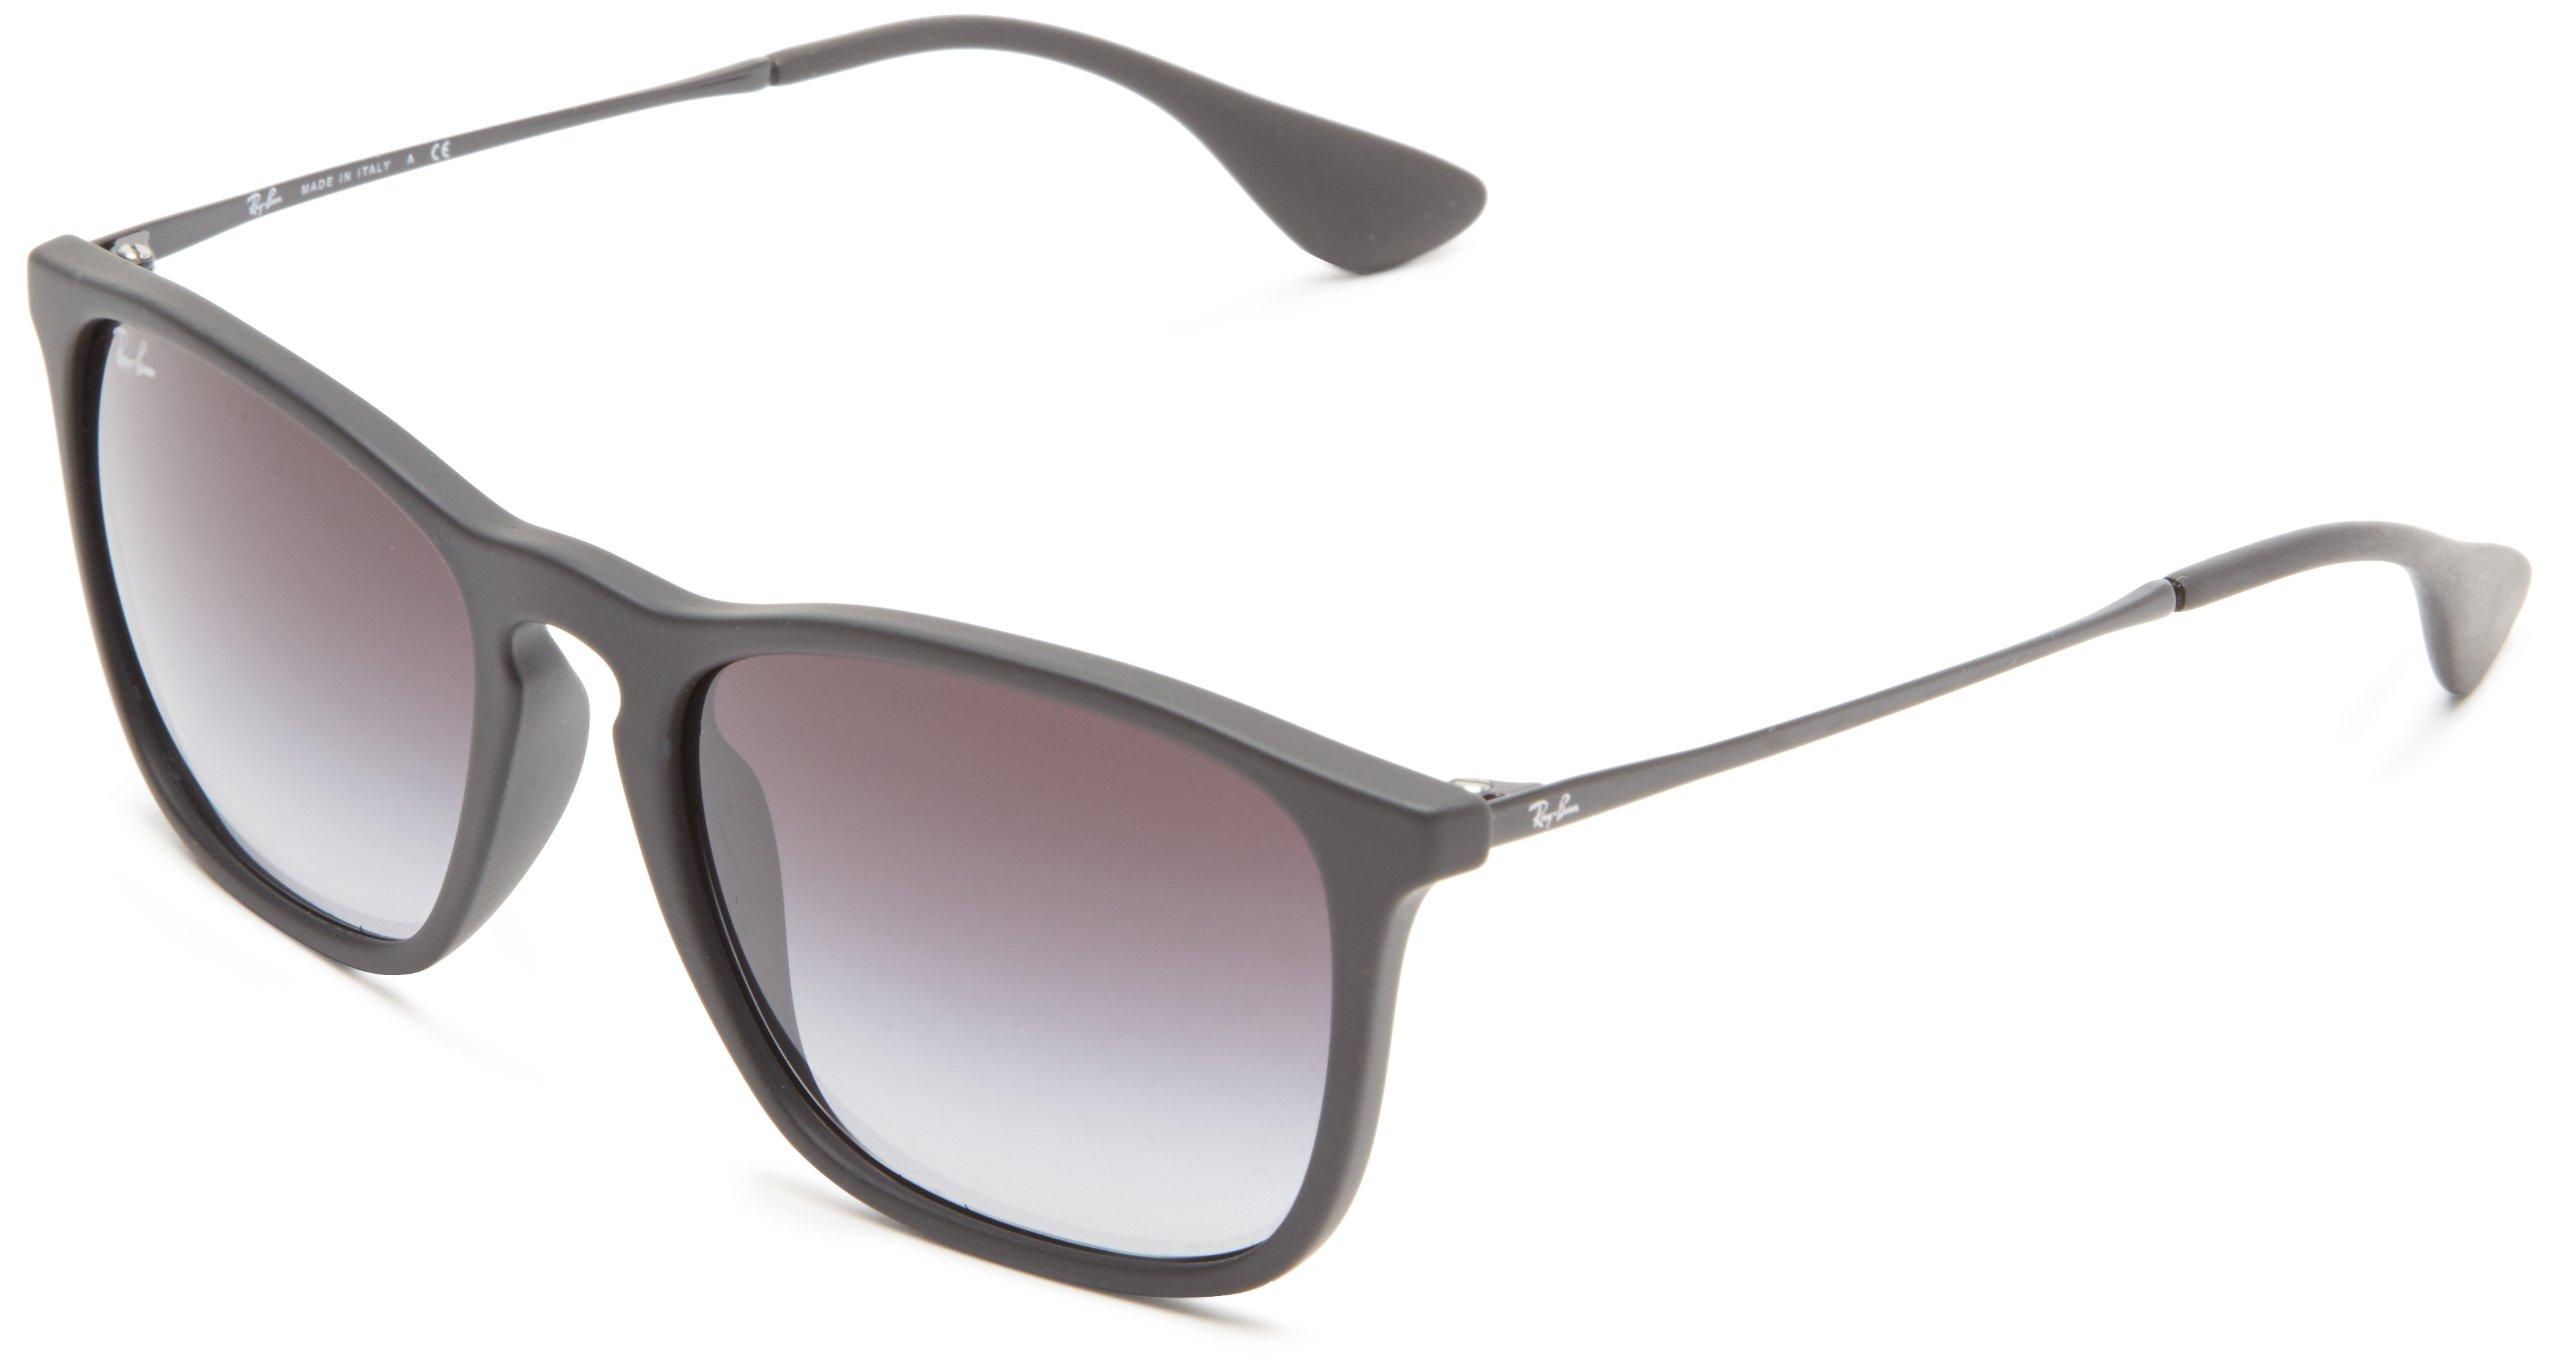 Ray-Ban Unisex RB4187 622/8G Chris Sunglasses Rubber Black